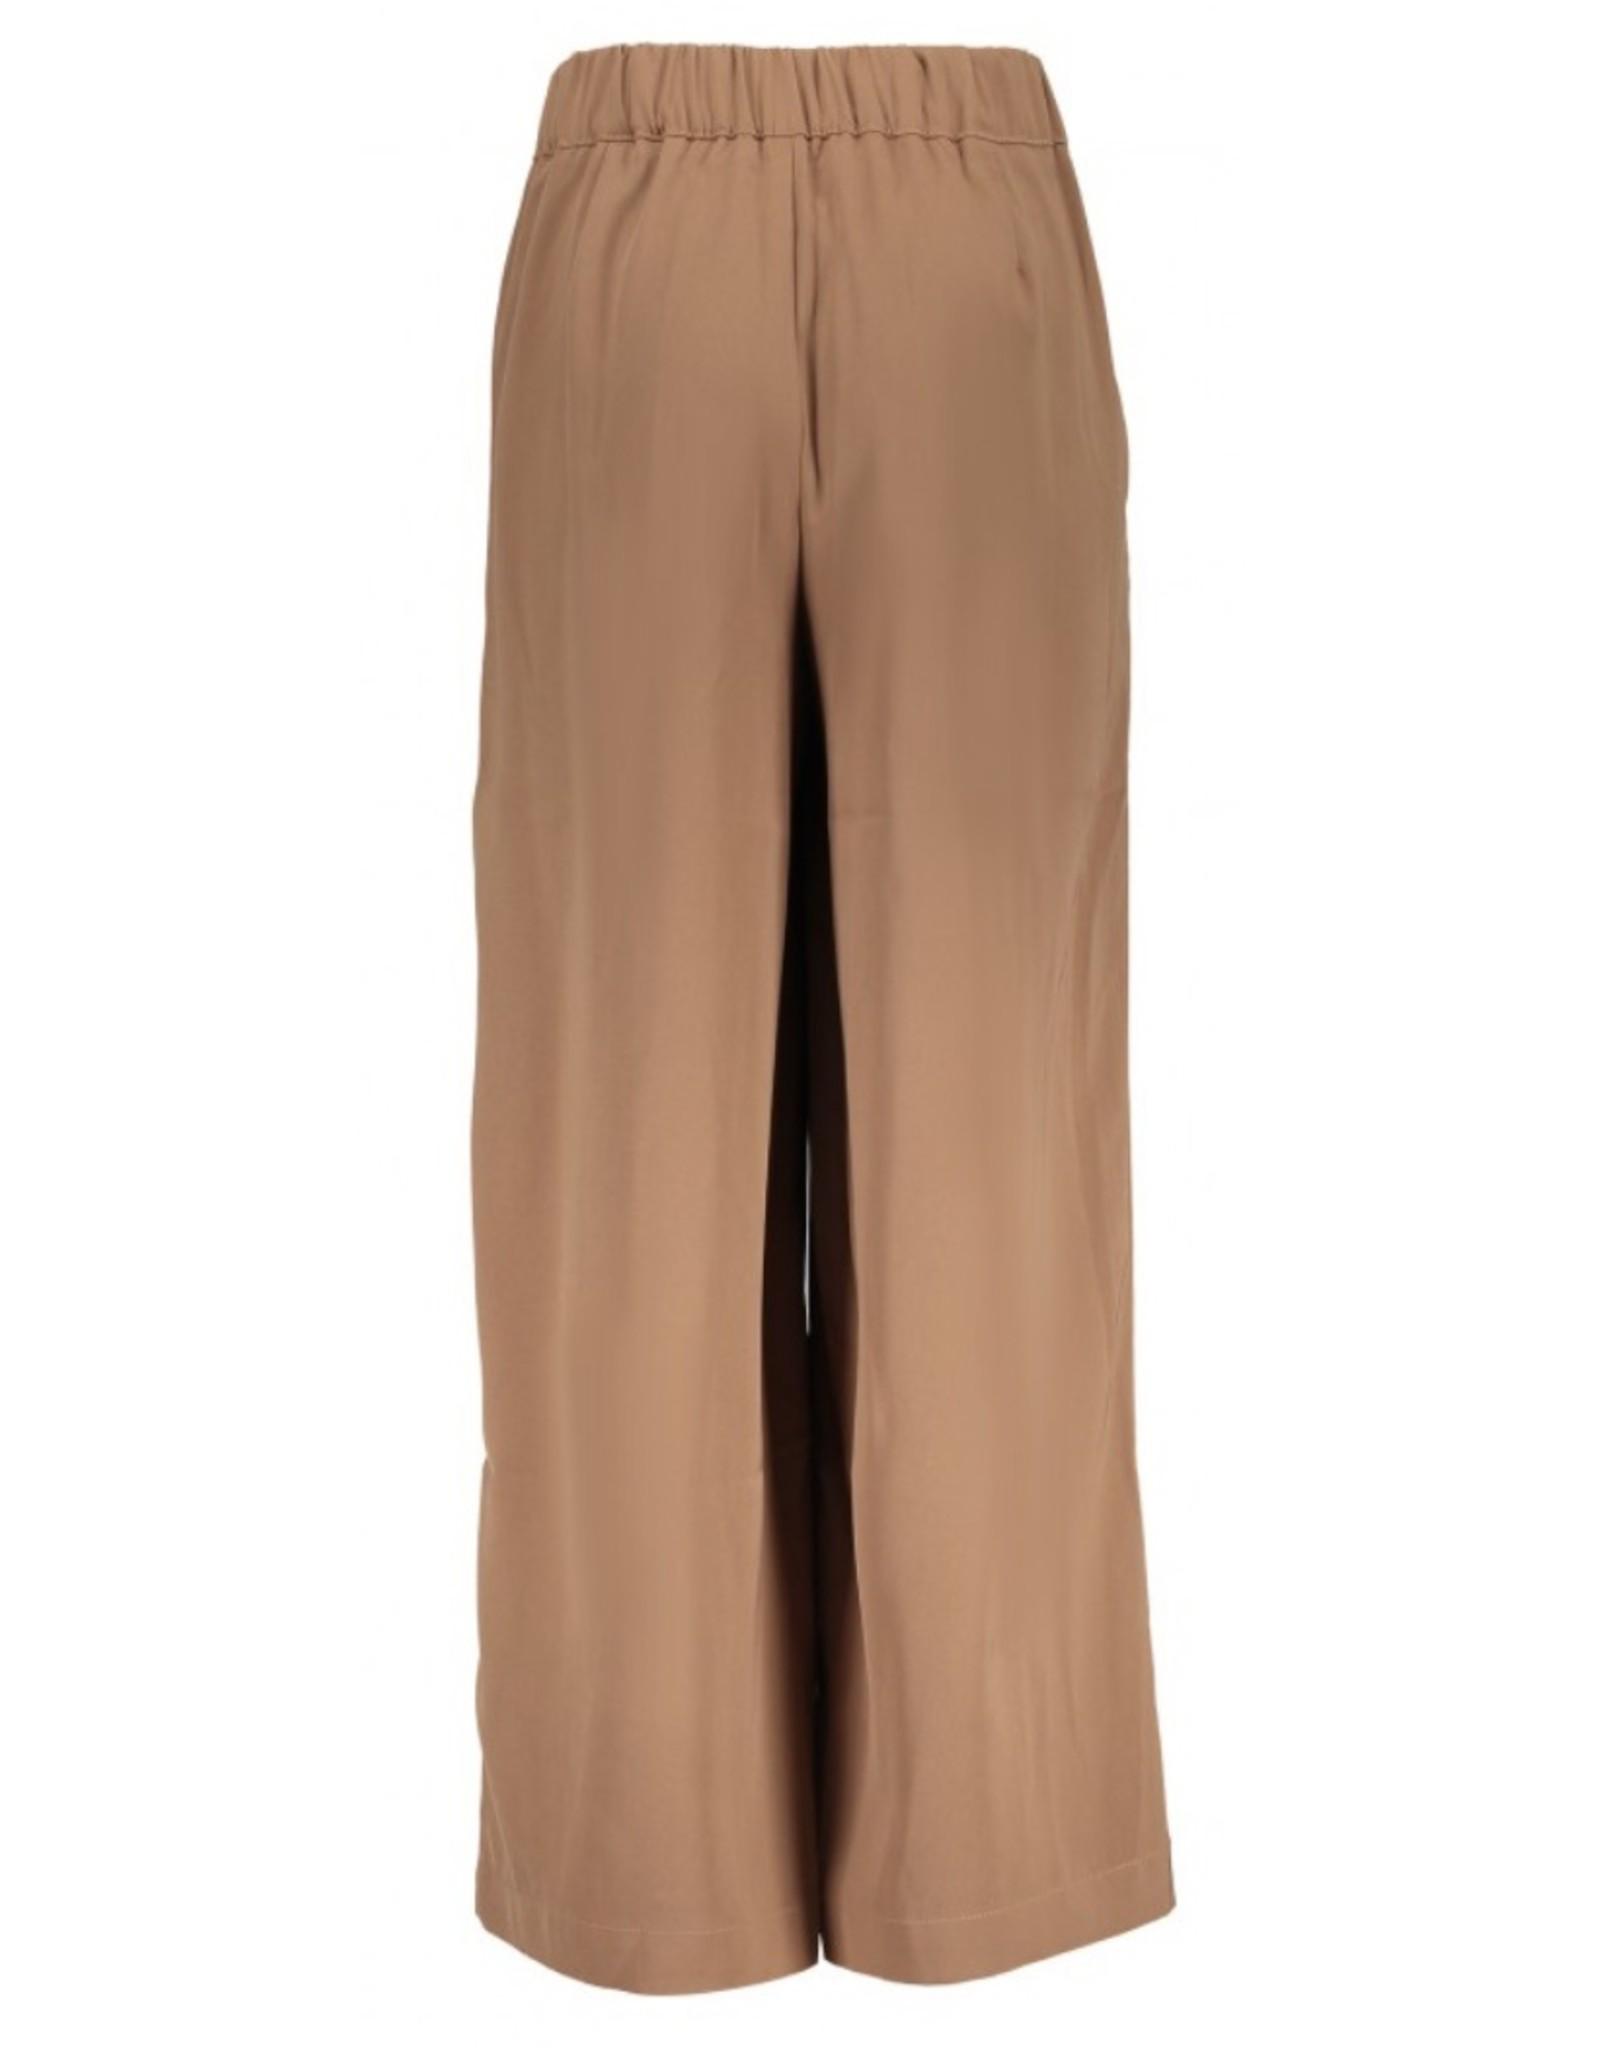 Frankie & Liberty Roxy Pants